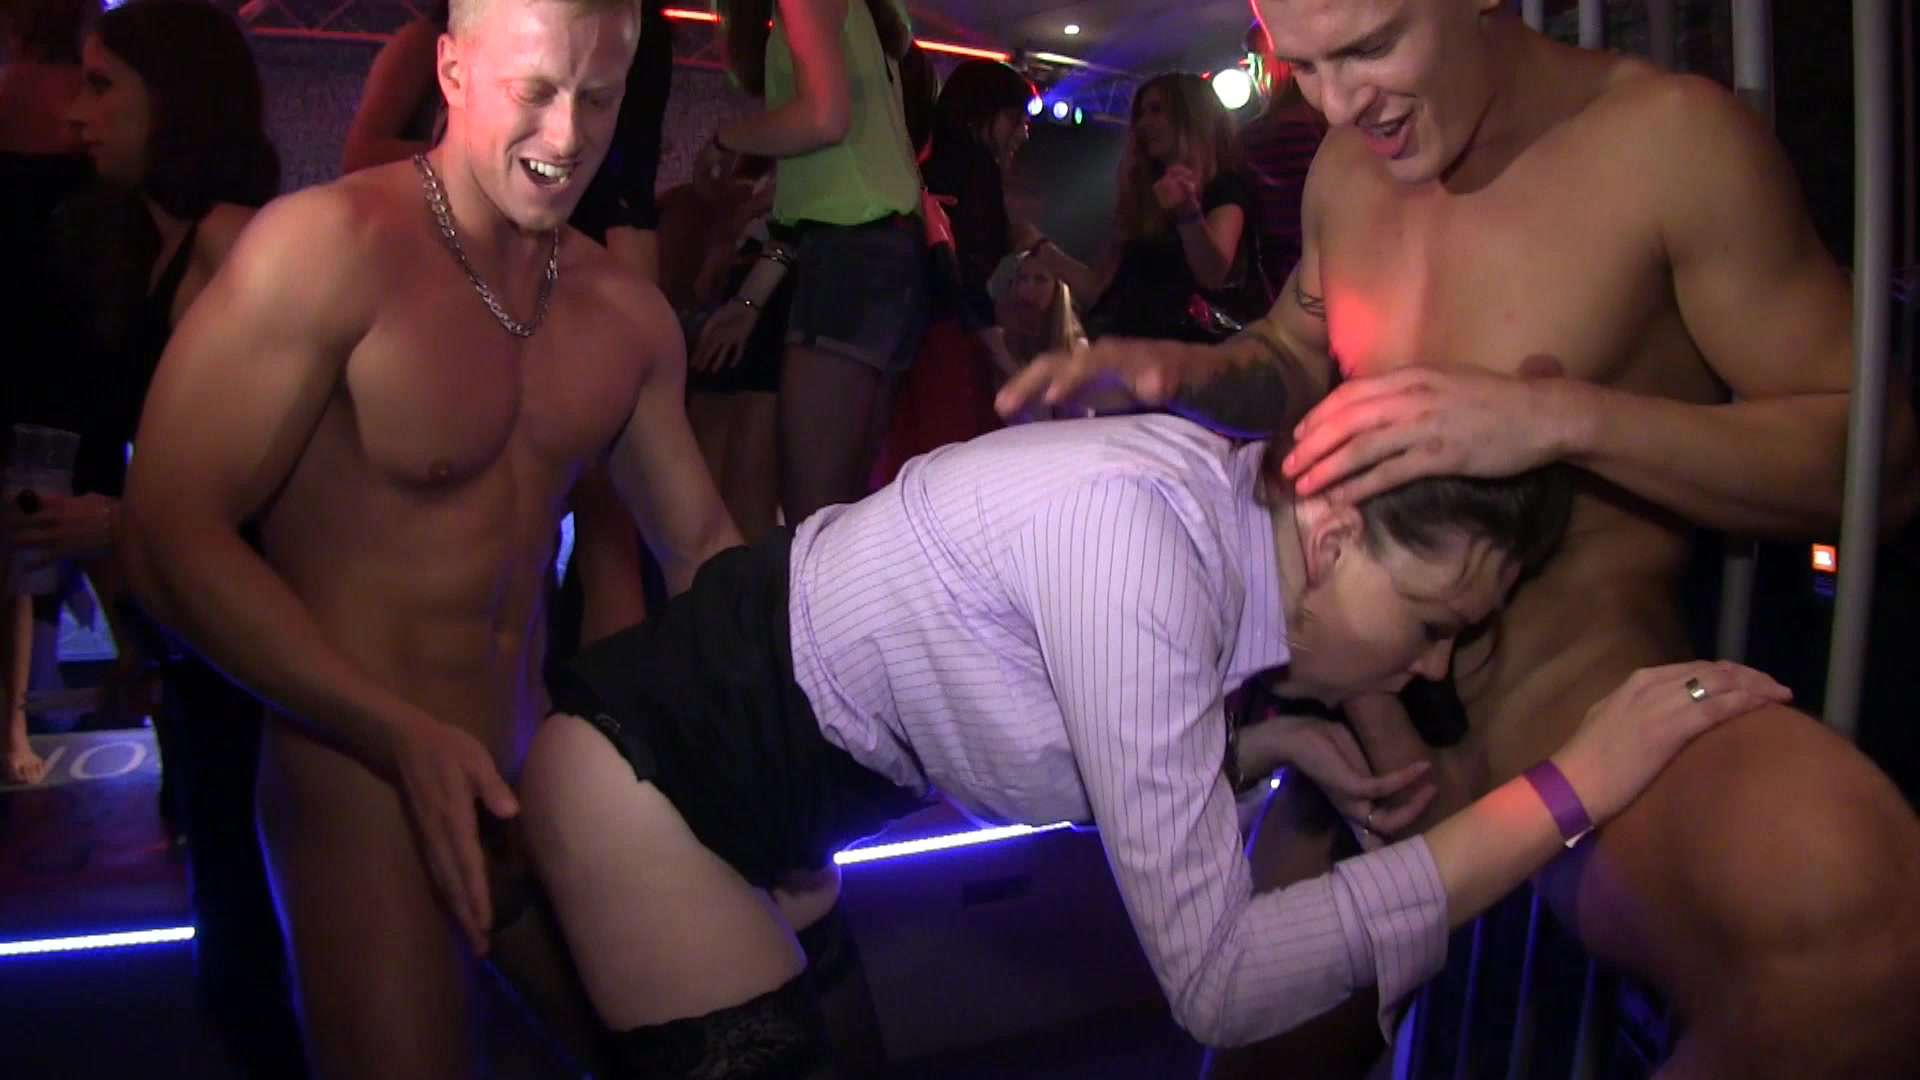 Orgy sex parties 5